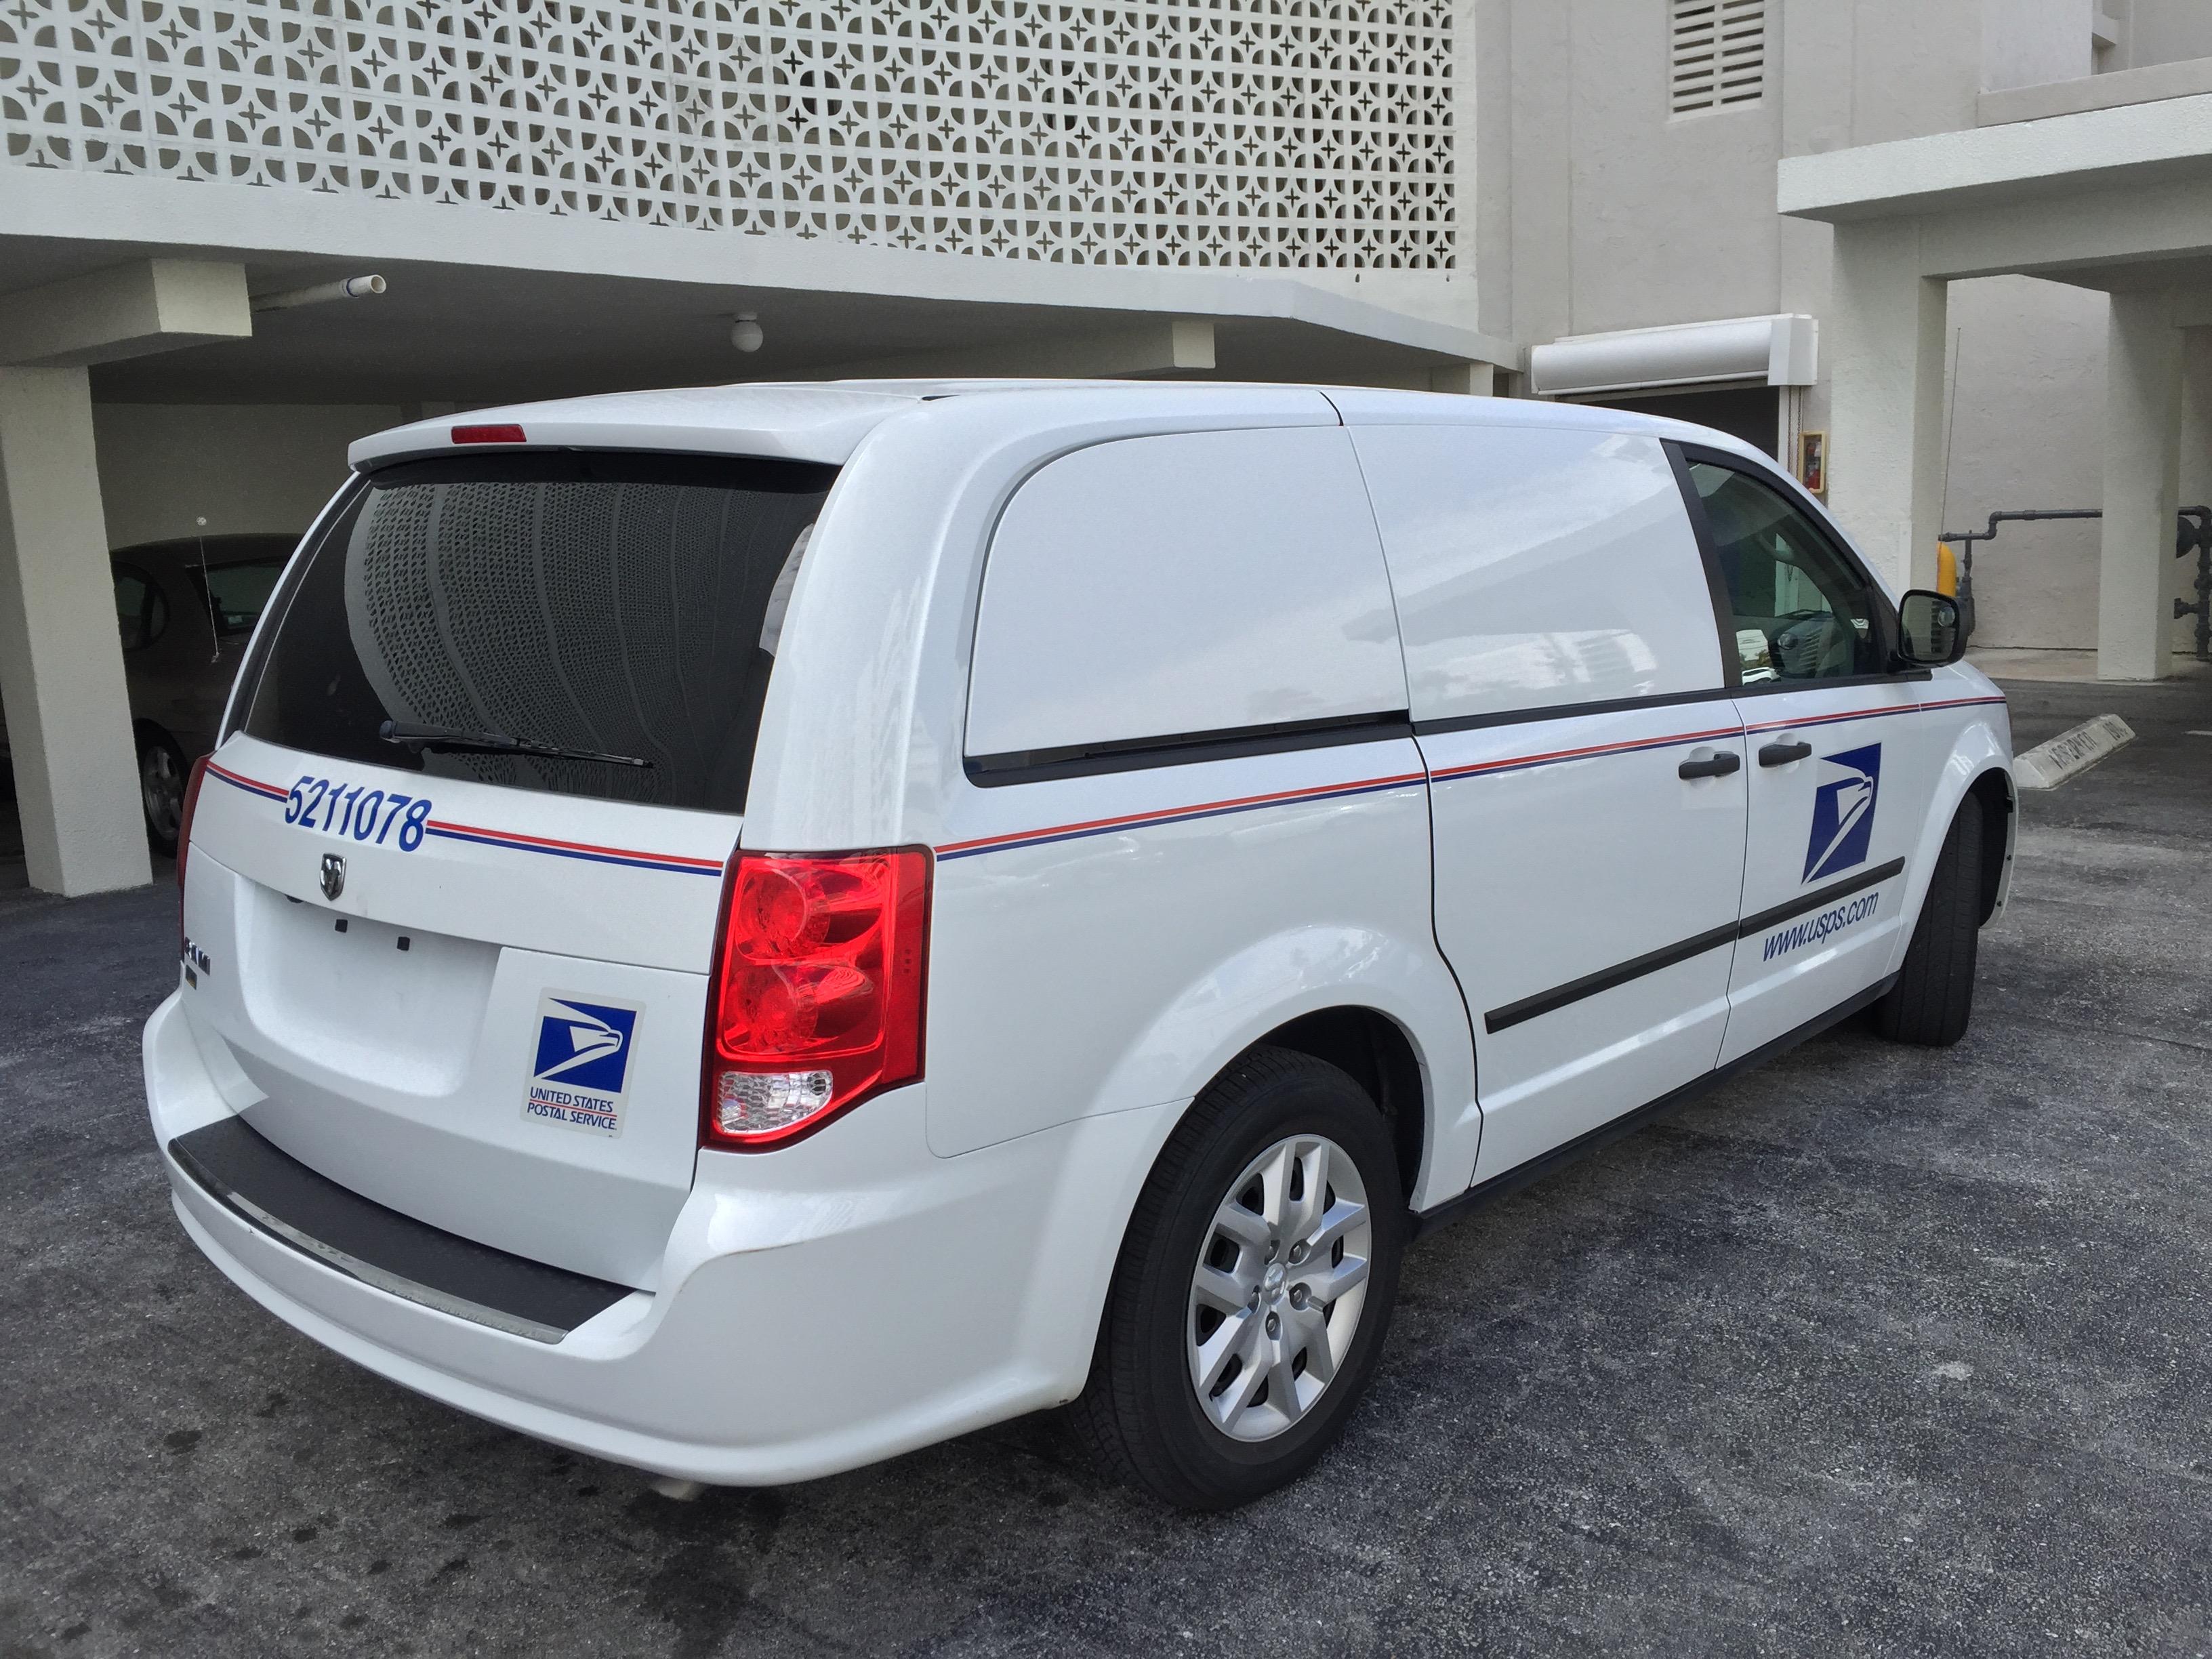 File:Ram Cargo Van - United States Postal Service - Palm Beach